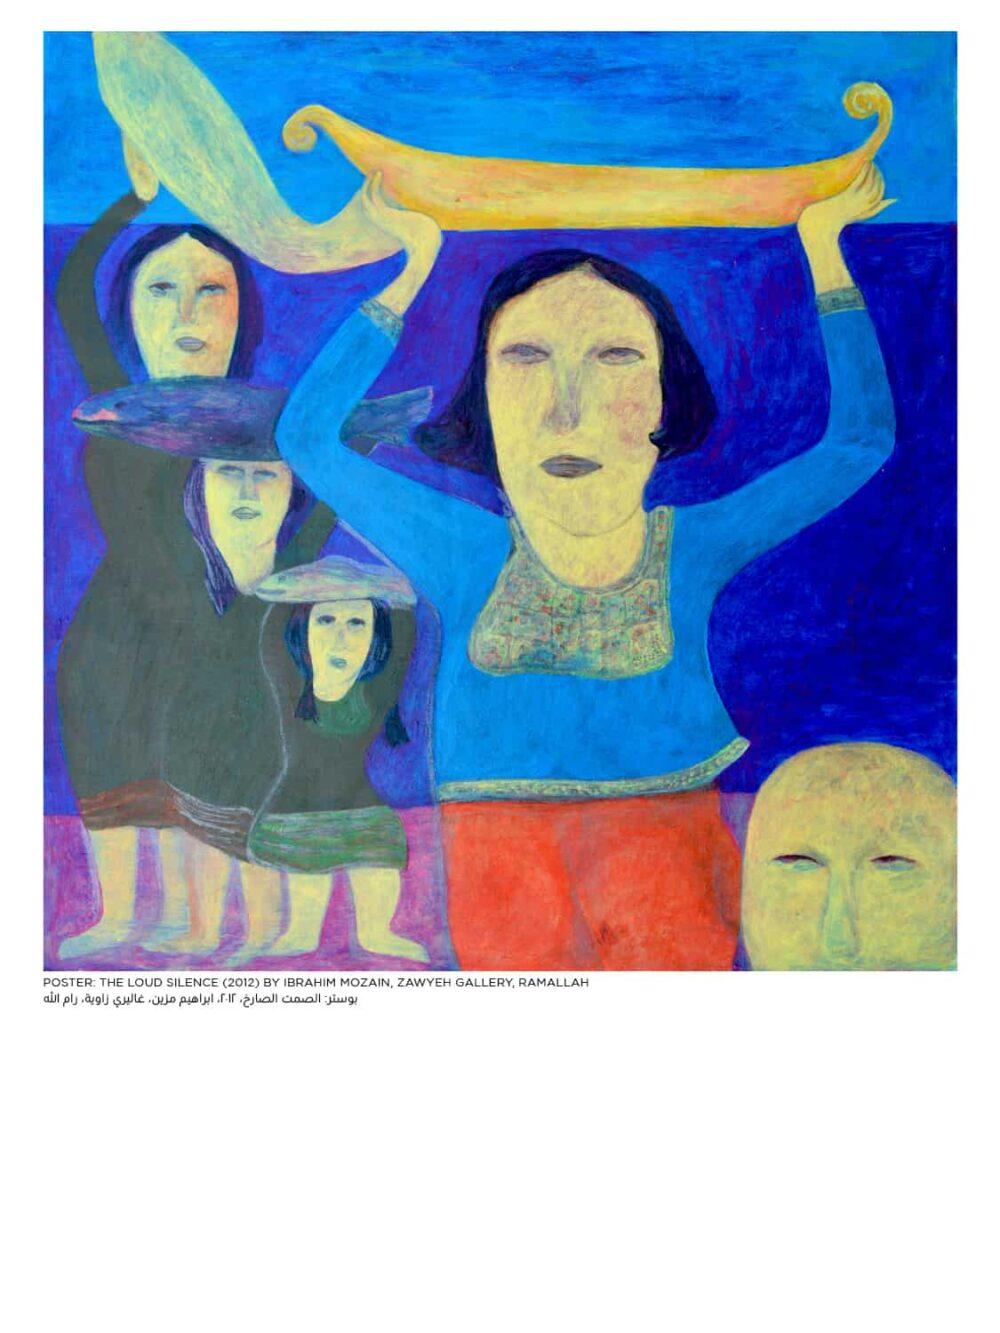 The Loud Silence by Ibrahim Mozain